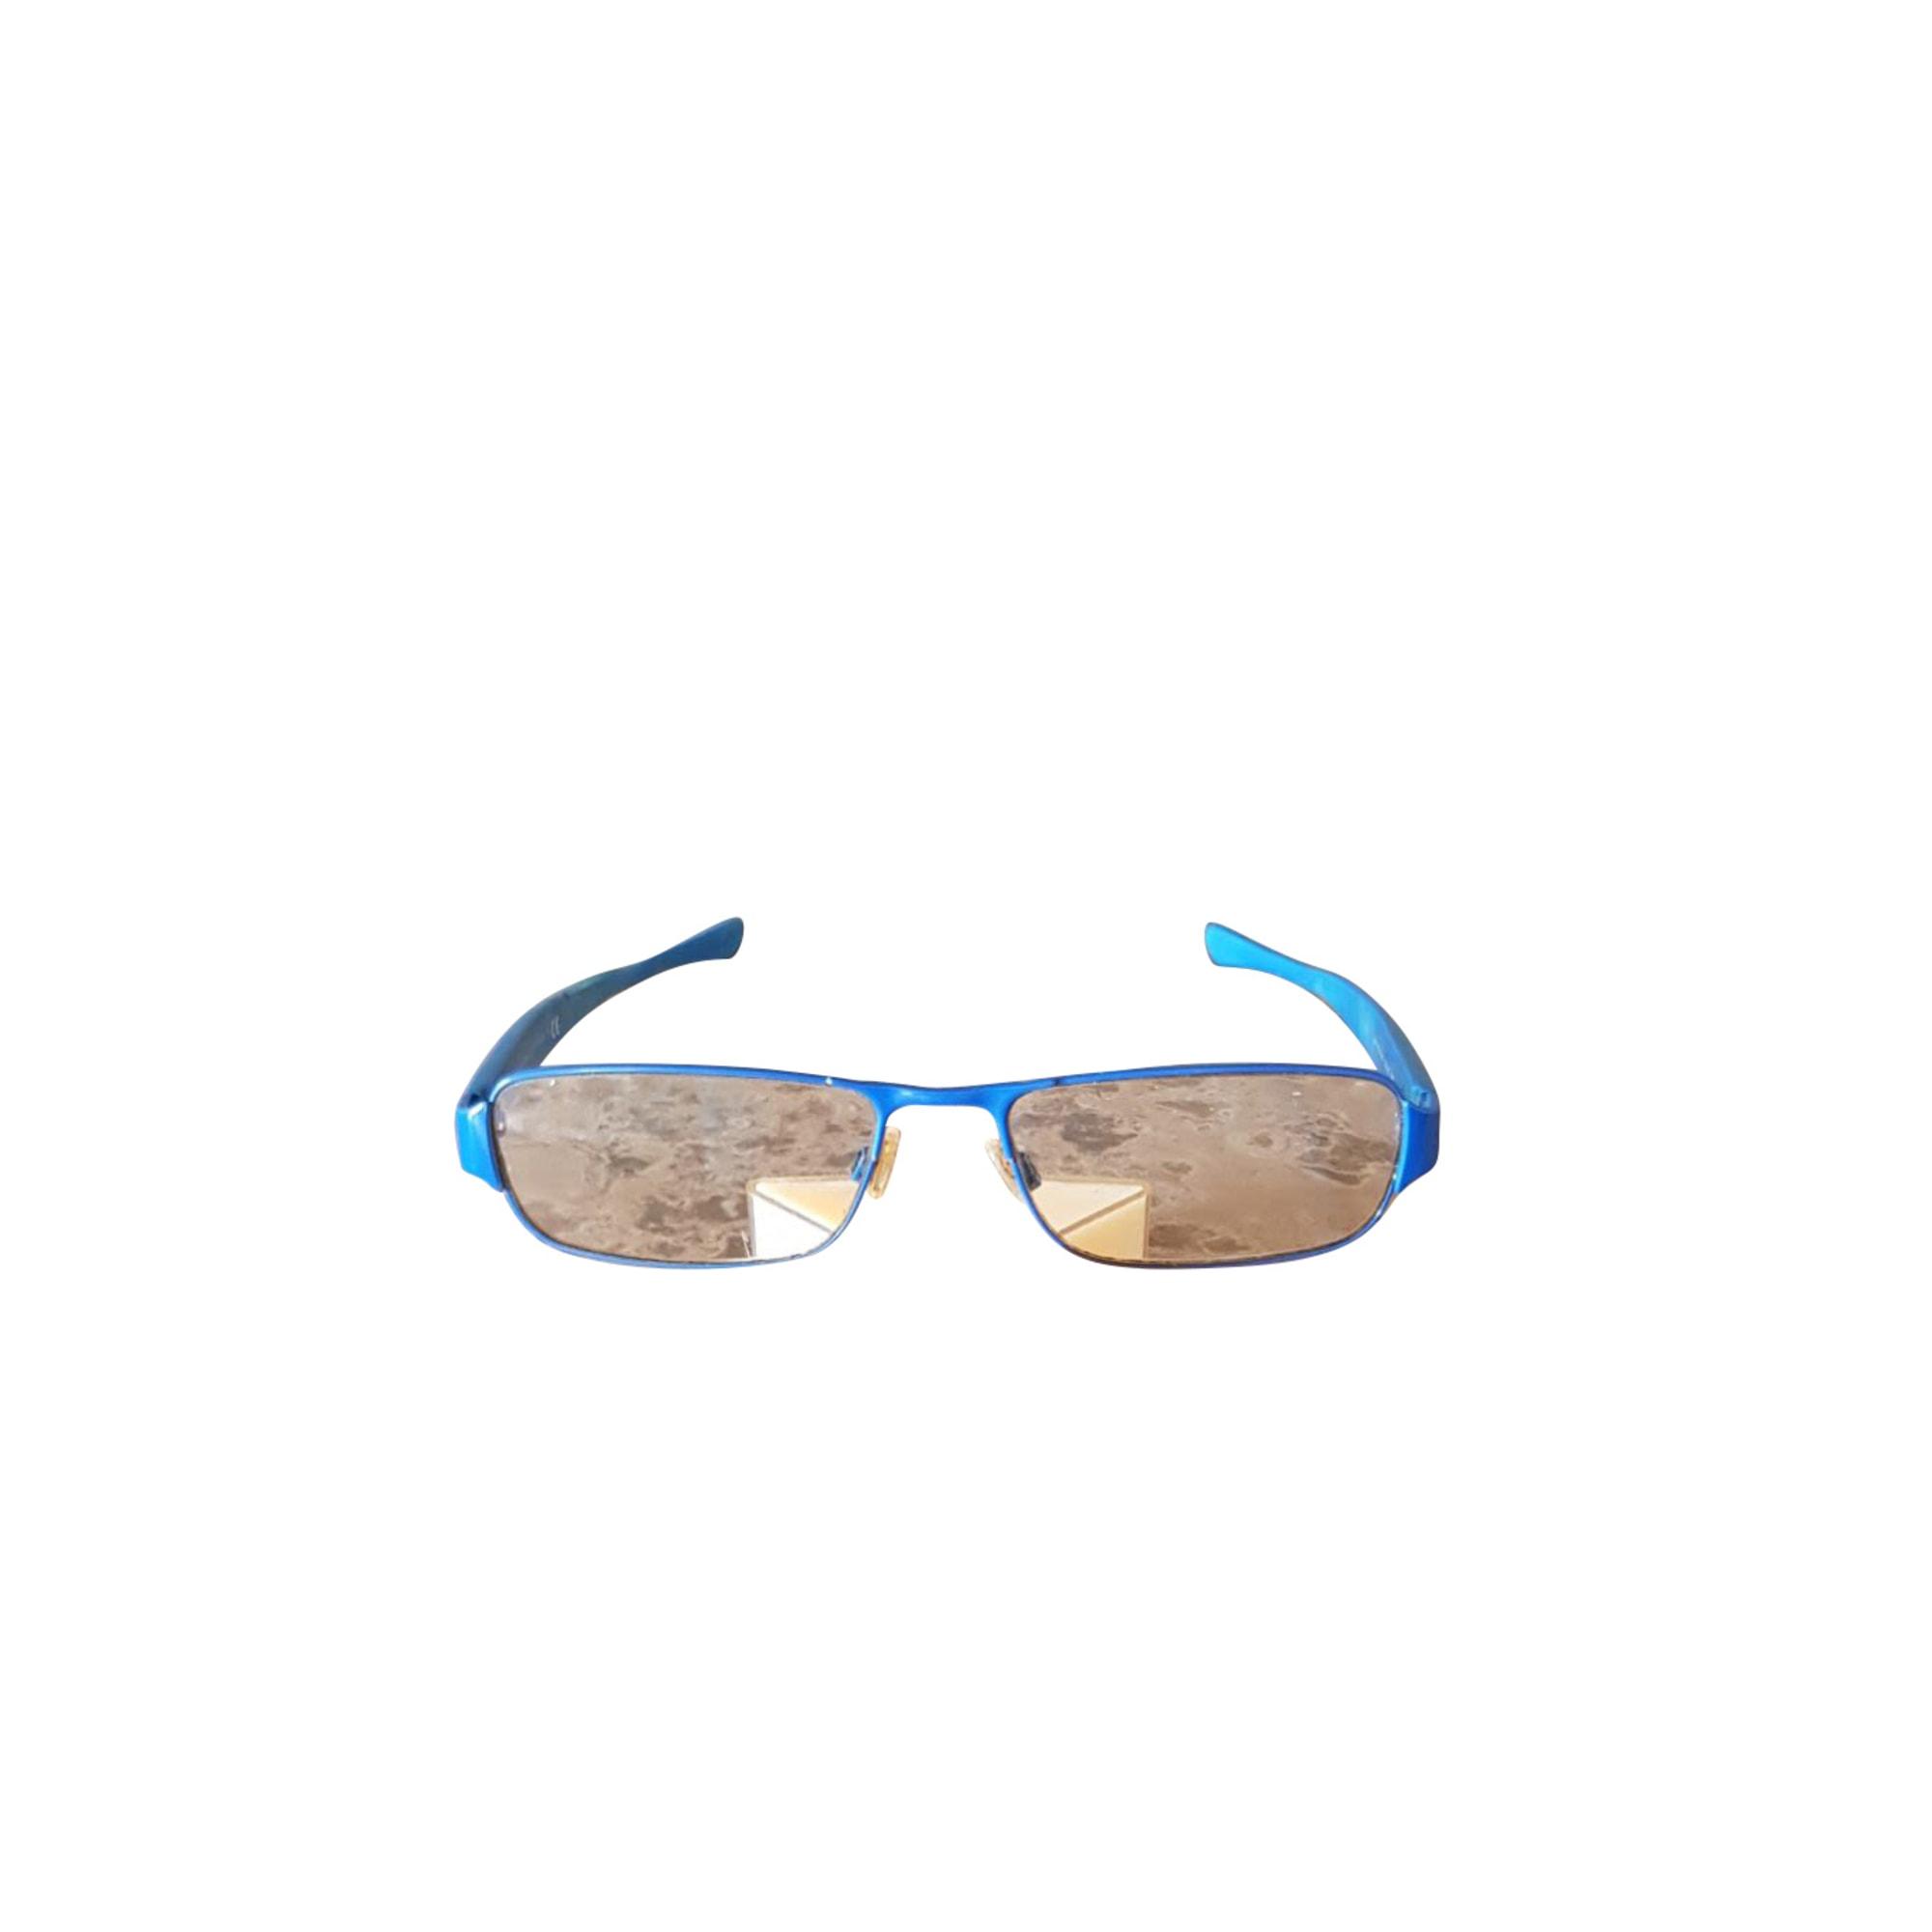 Eyeglass Frames RALPH LAUREN Blue, navy, turquoise